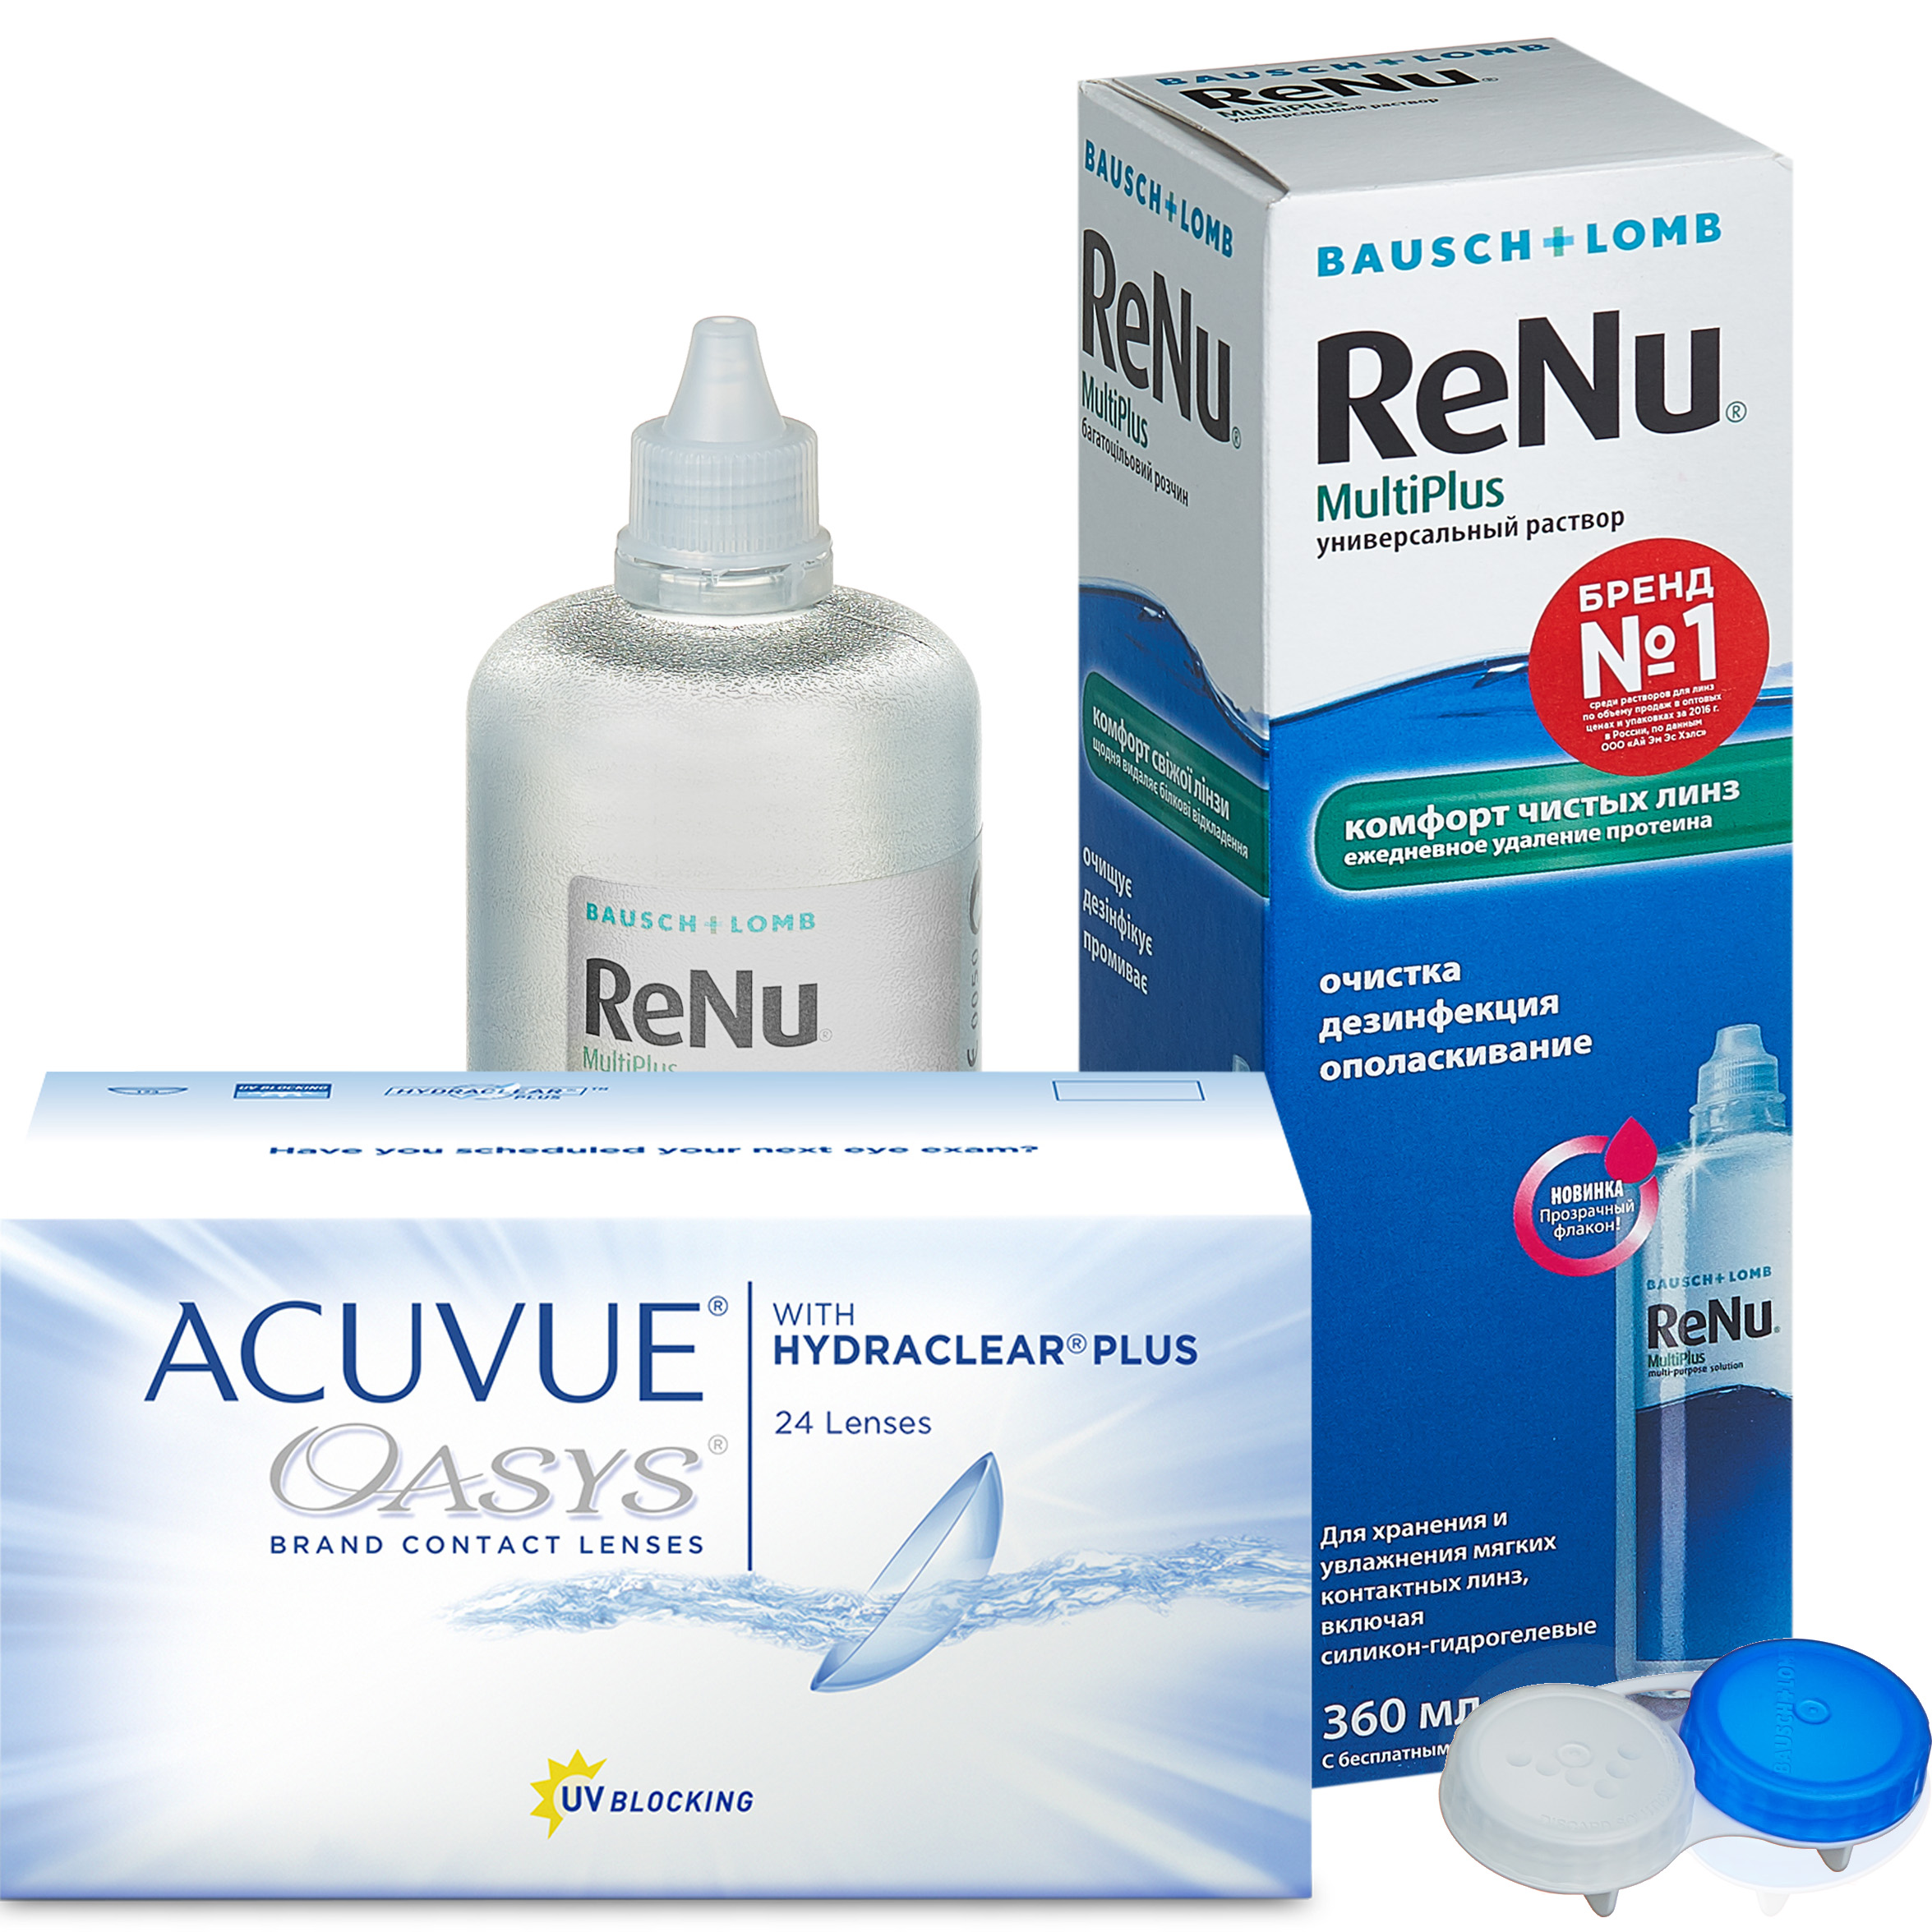 Купить Oasys with Hydraclear Plus 24 линзы + ReNu MultiPlus, Линзы Acuvue Oasys with Hydraclear Plus 24 линзы R 8.8 -8, 00 + ReNu Multi Plus 360 мл